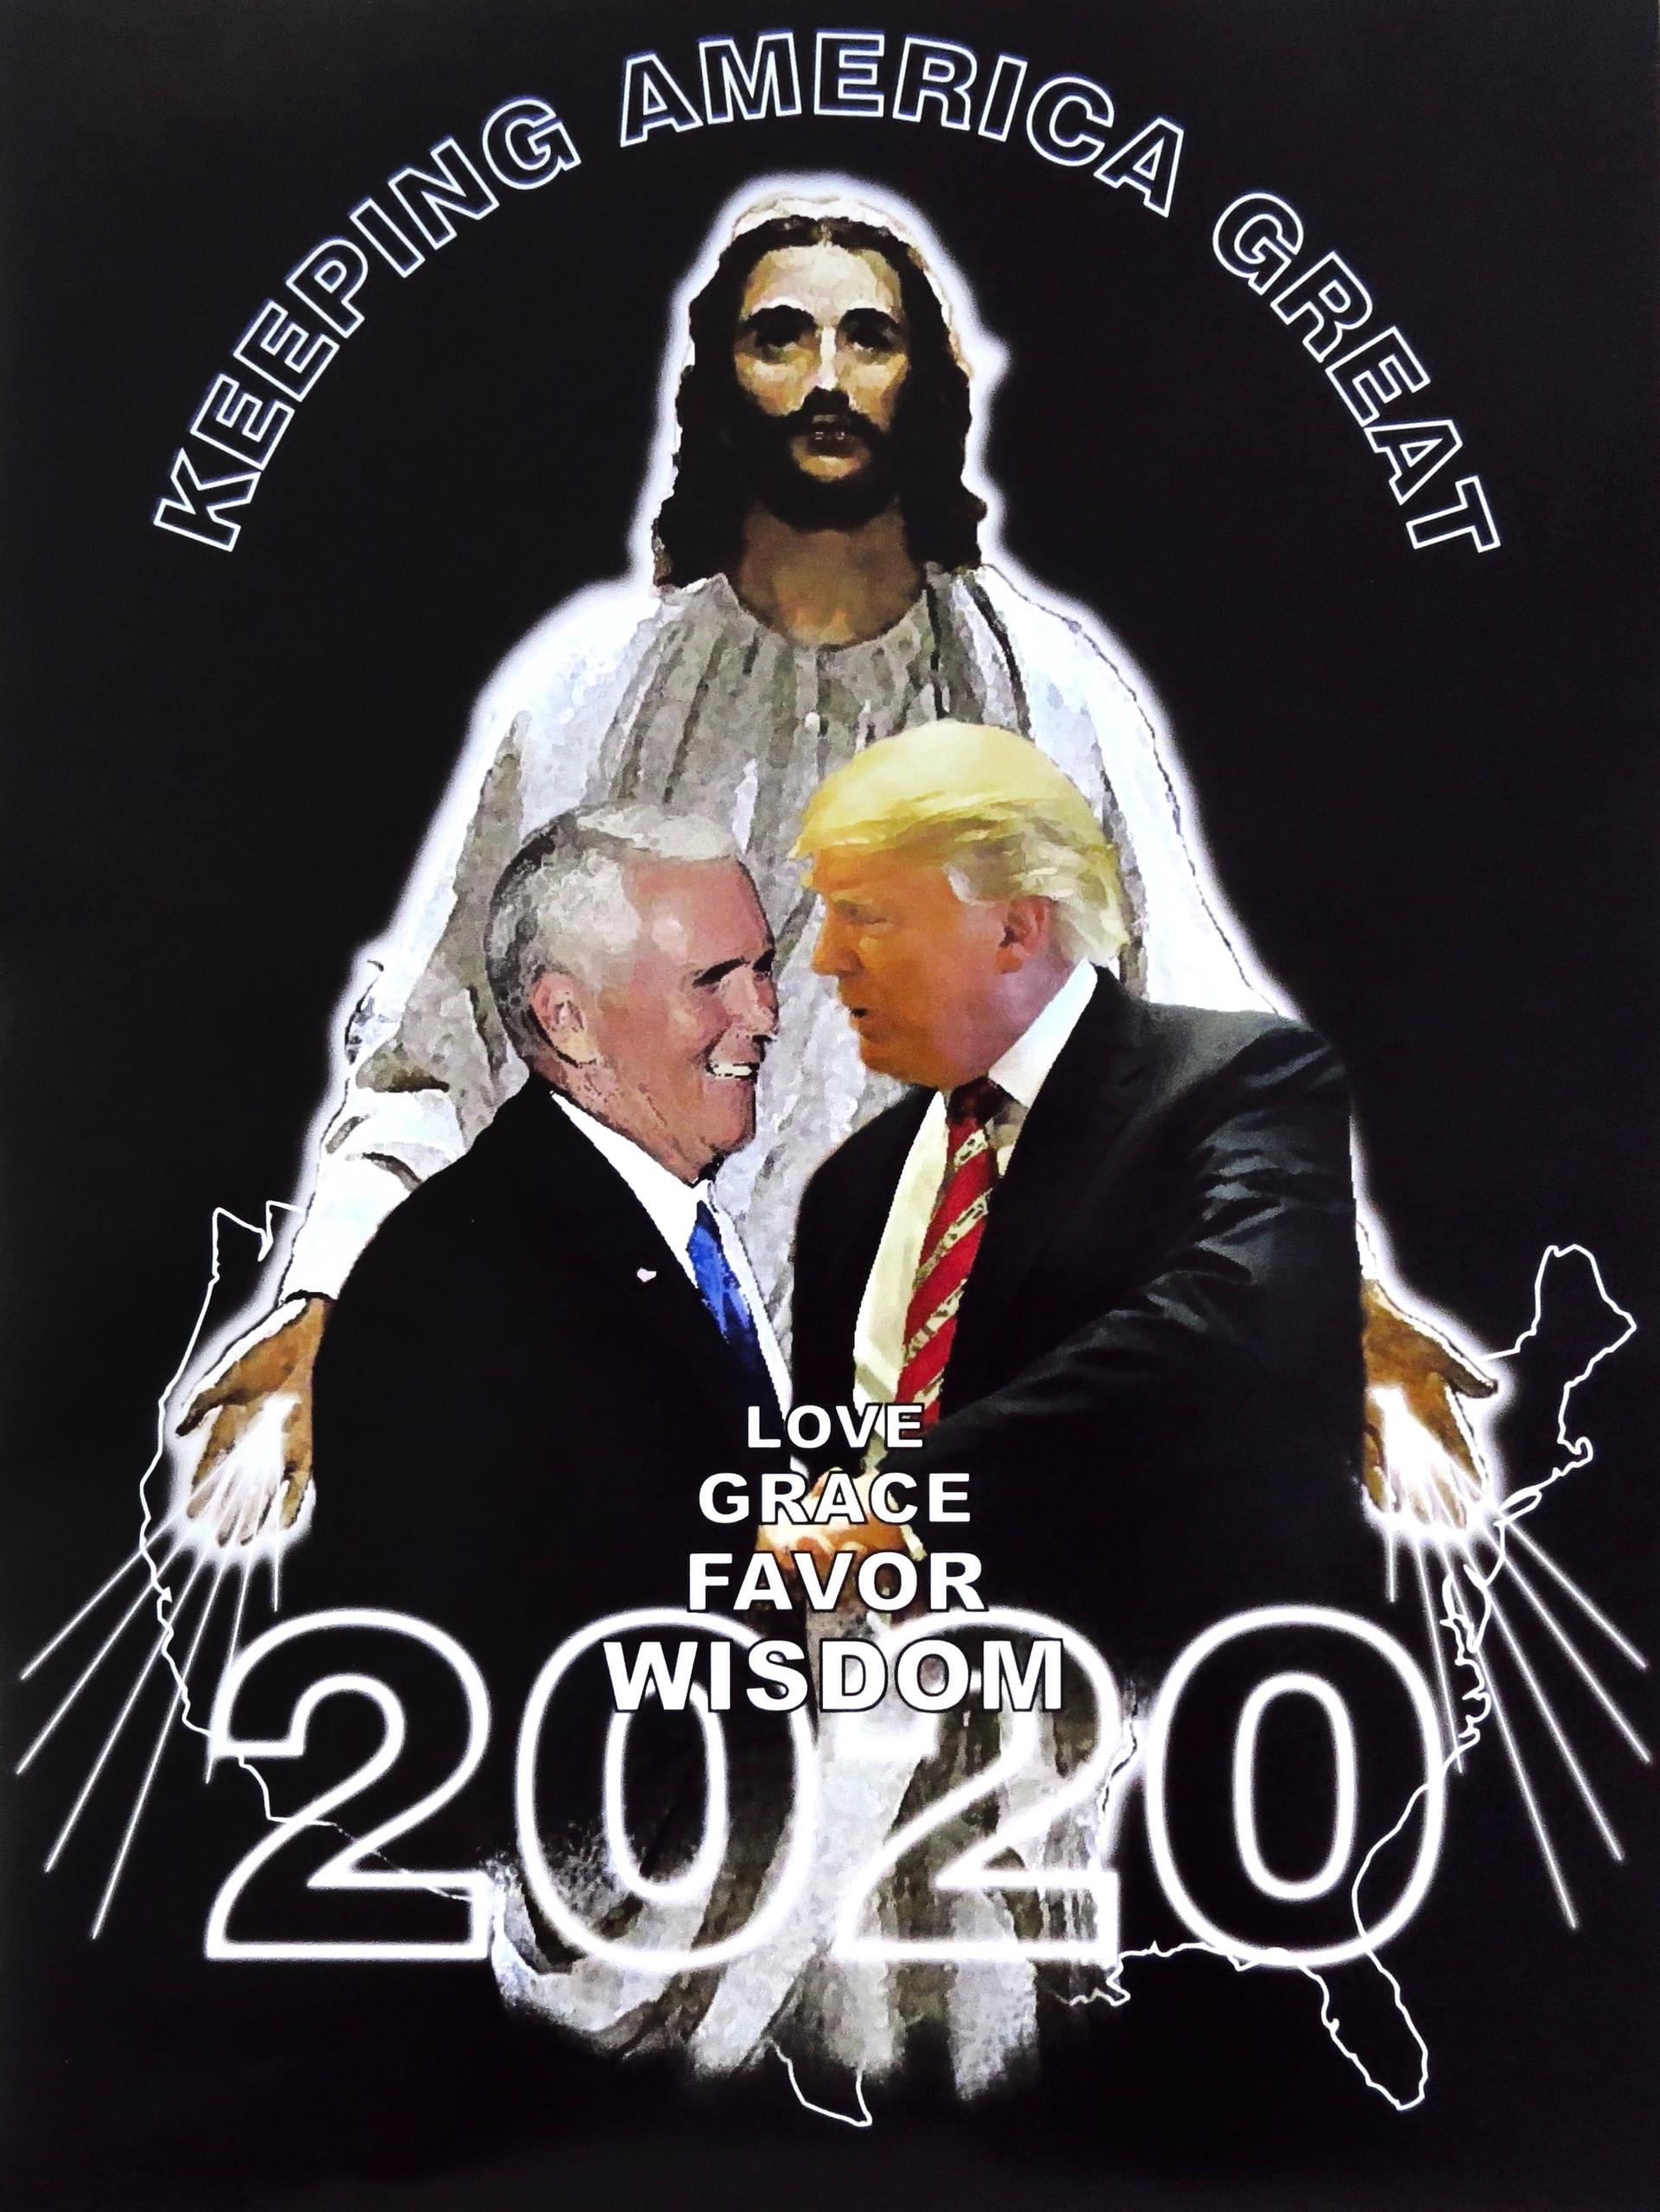 Jesus for Trump (Keeping America Great)